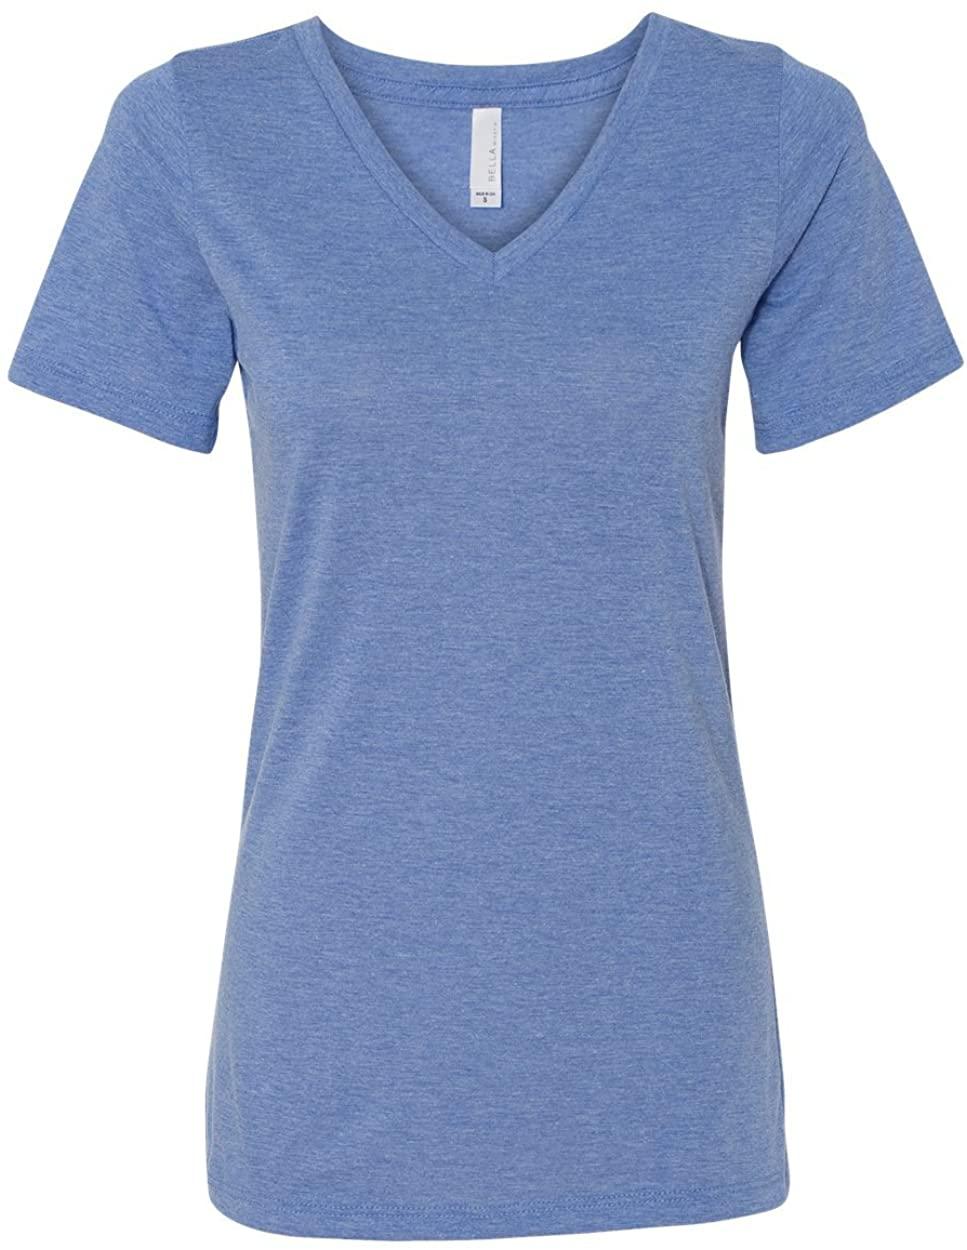 Bella girls Missy's Relaxed Jersey Short-Sleeve V-Neck T-Shirt(6405)-BLUE TRIBLEND-L